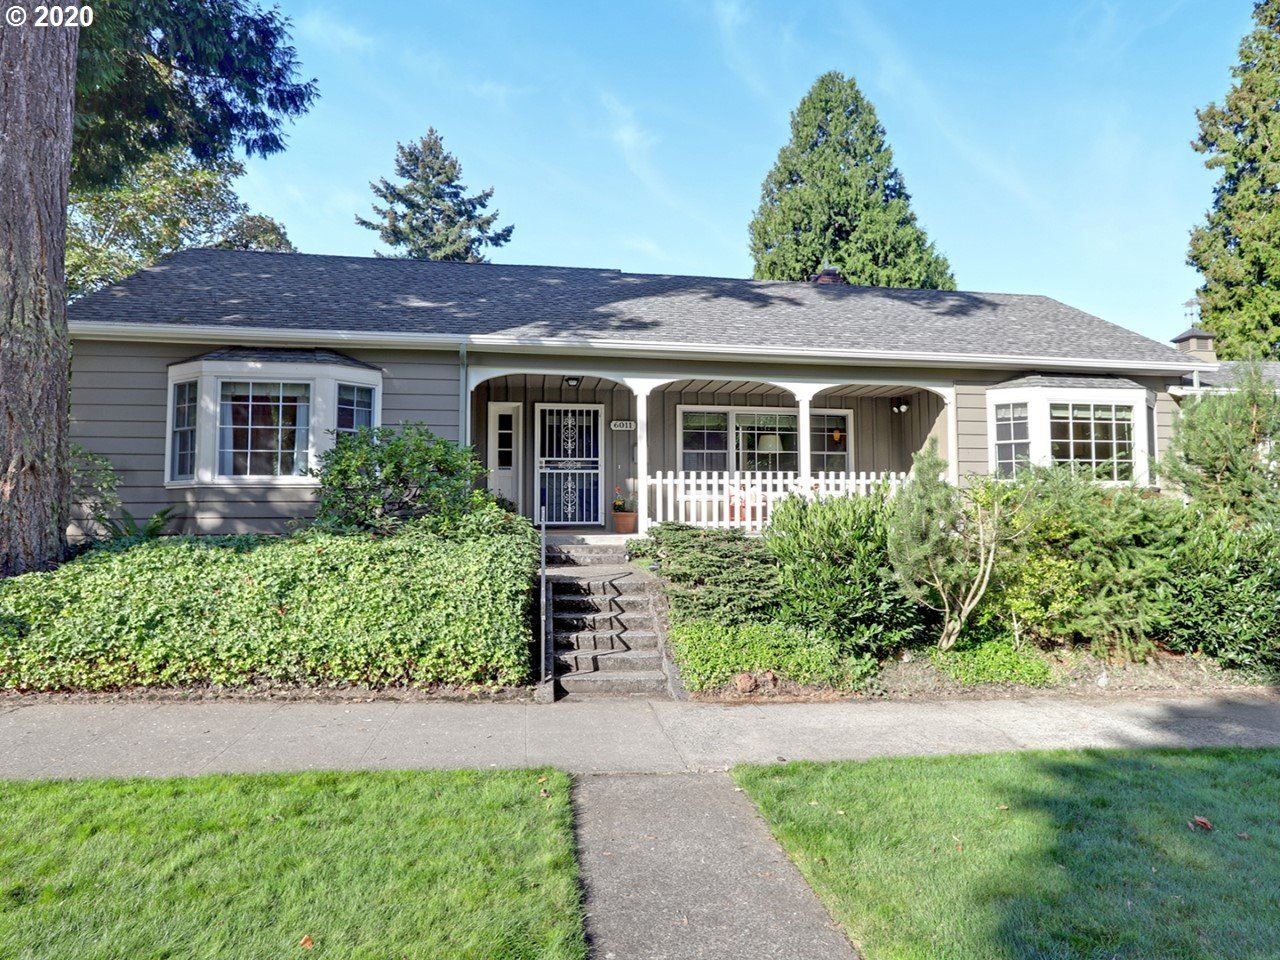 6011 NE 32ND AVE, Portland, OR 97211 - MLS#: 20405532